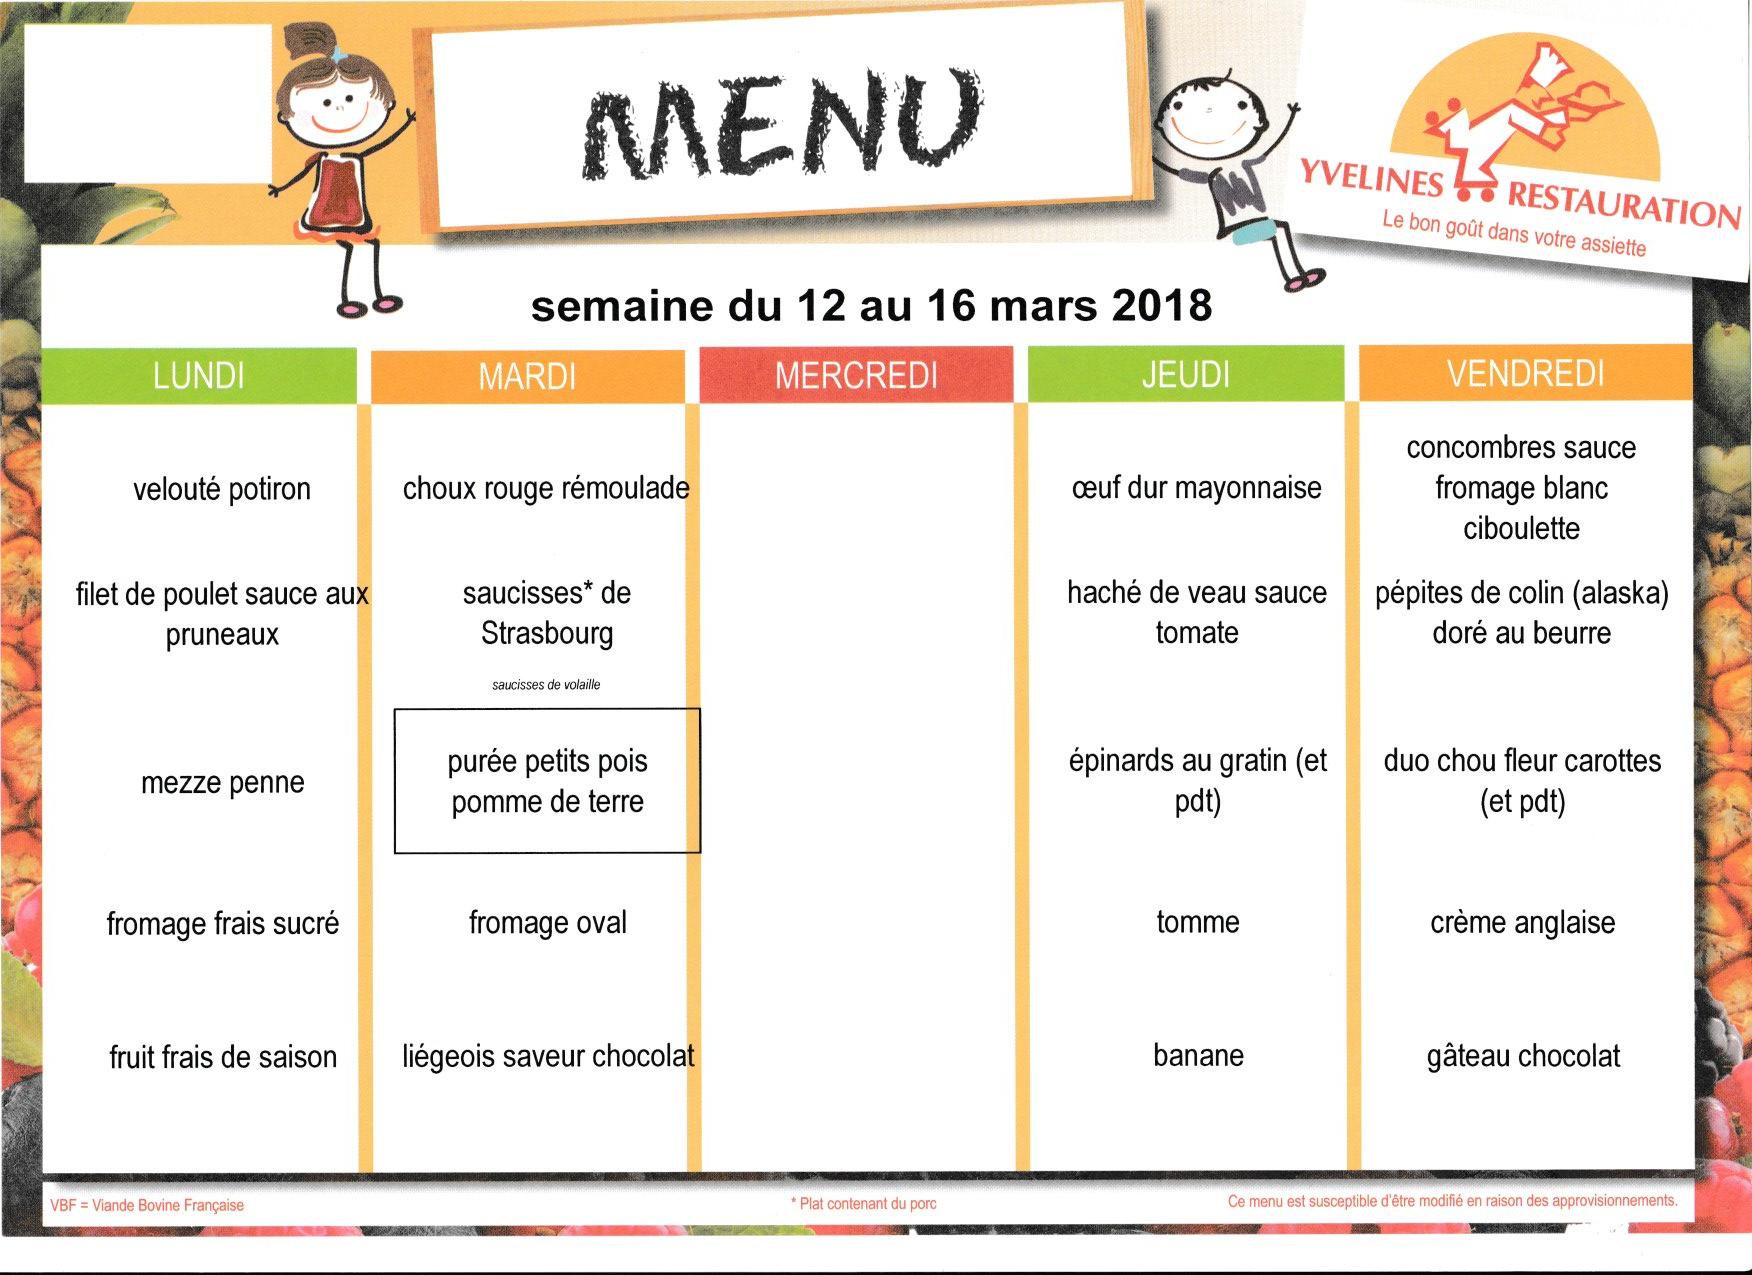 menu du 12 au 16 mars